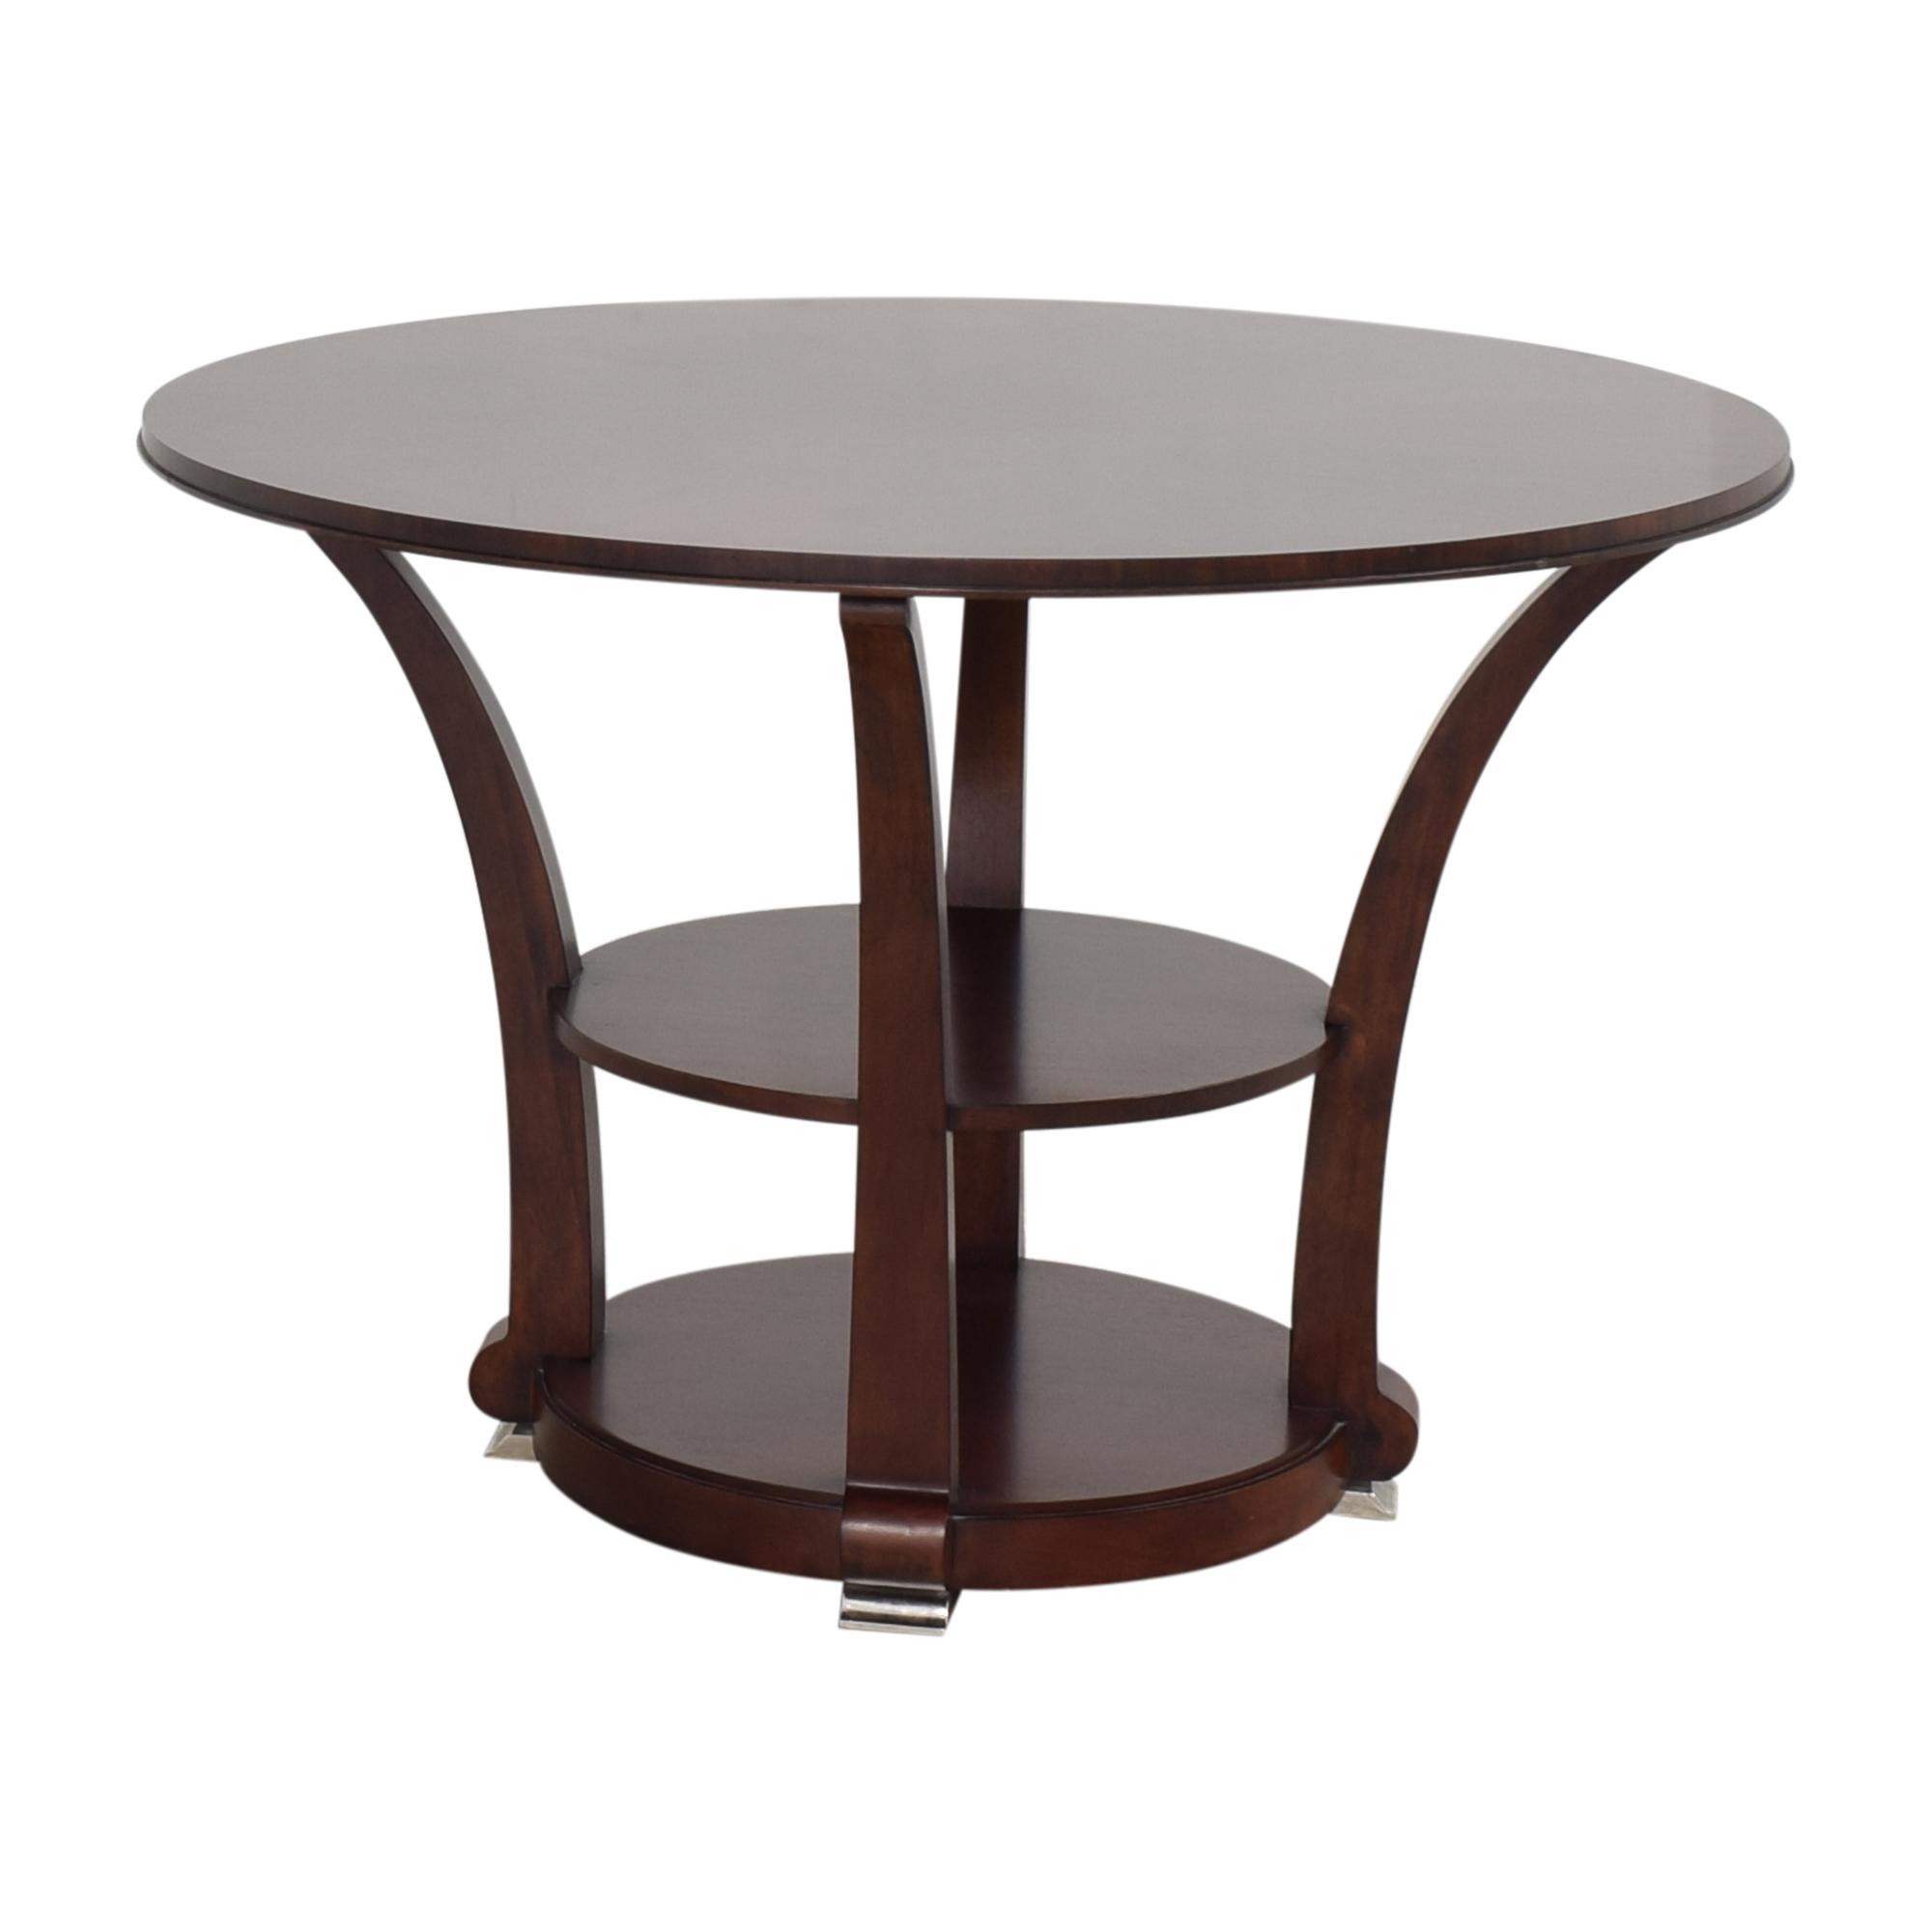 Hekman Furniture Hekman Metropolis Dining Table for sale